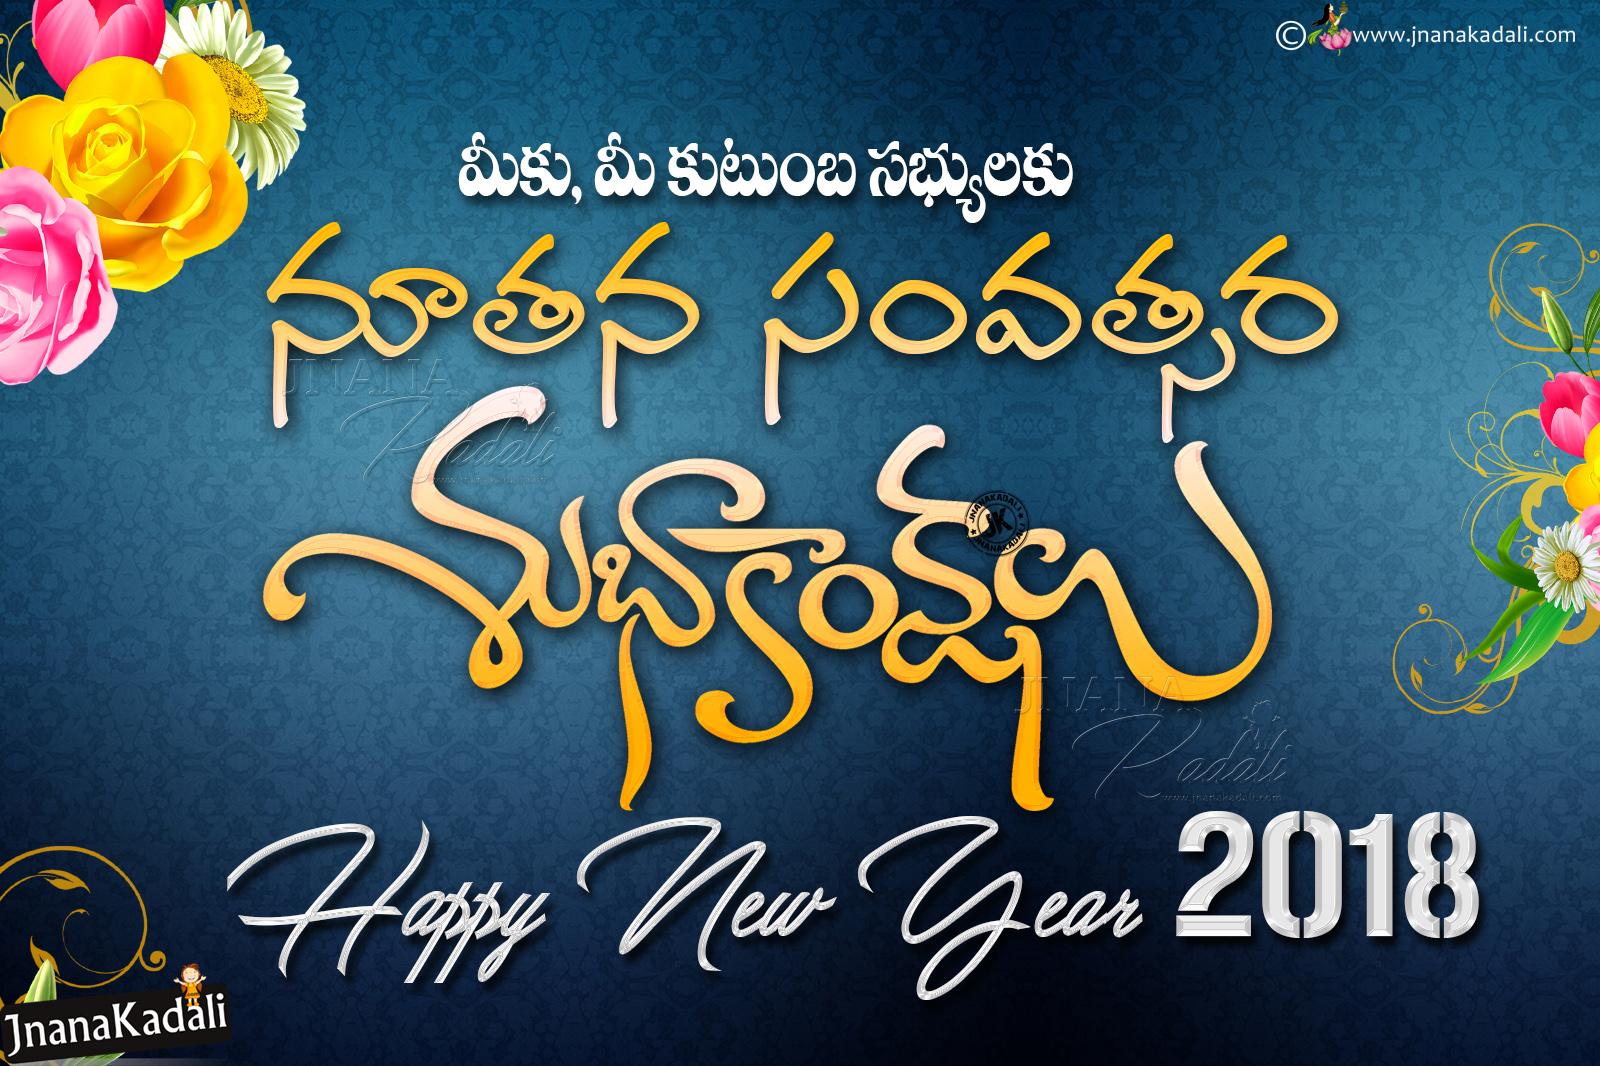 Trending telugu new year greetings free download happy new year 2018 telugu new year greetings best new year wallpapers quotes in telugu happy new m4hsunfo